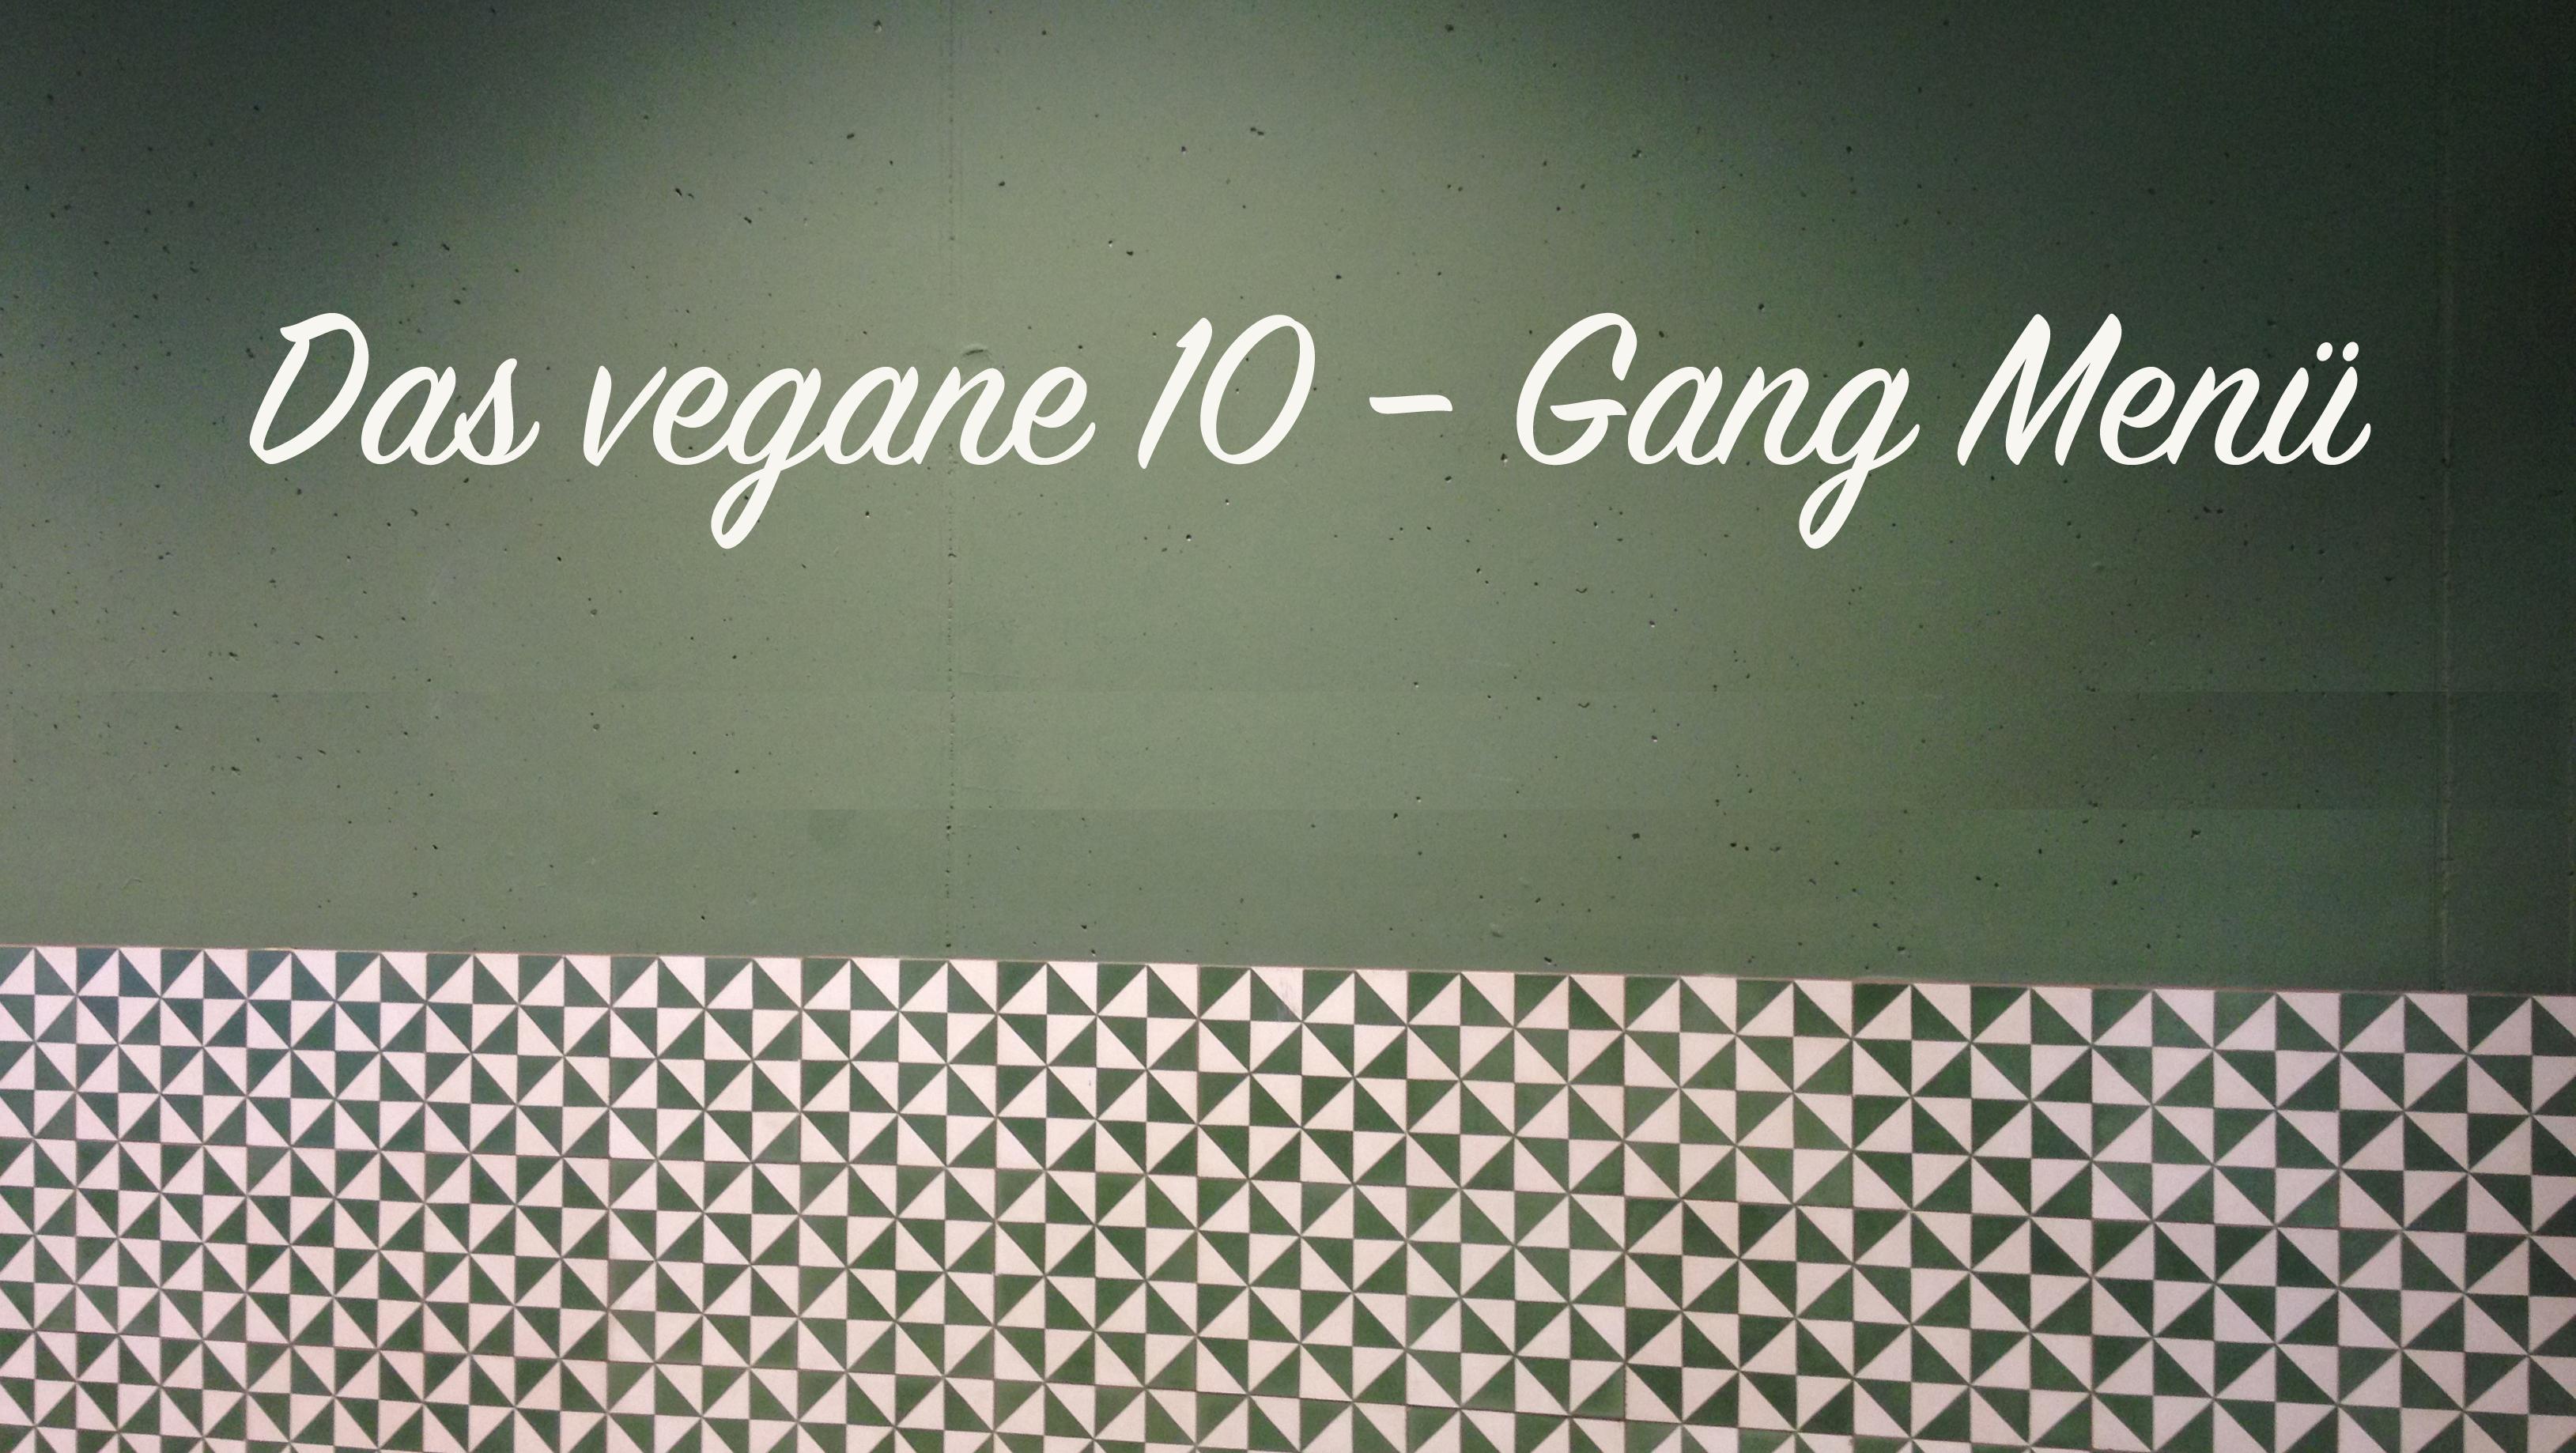 Das vegane 10 – Gang Menü